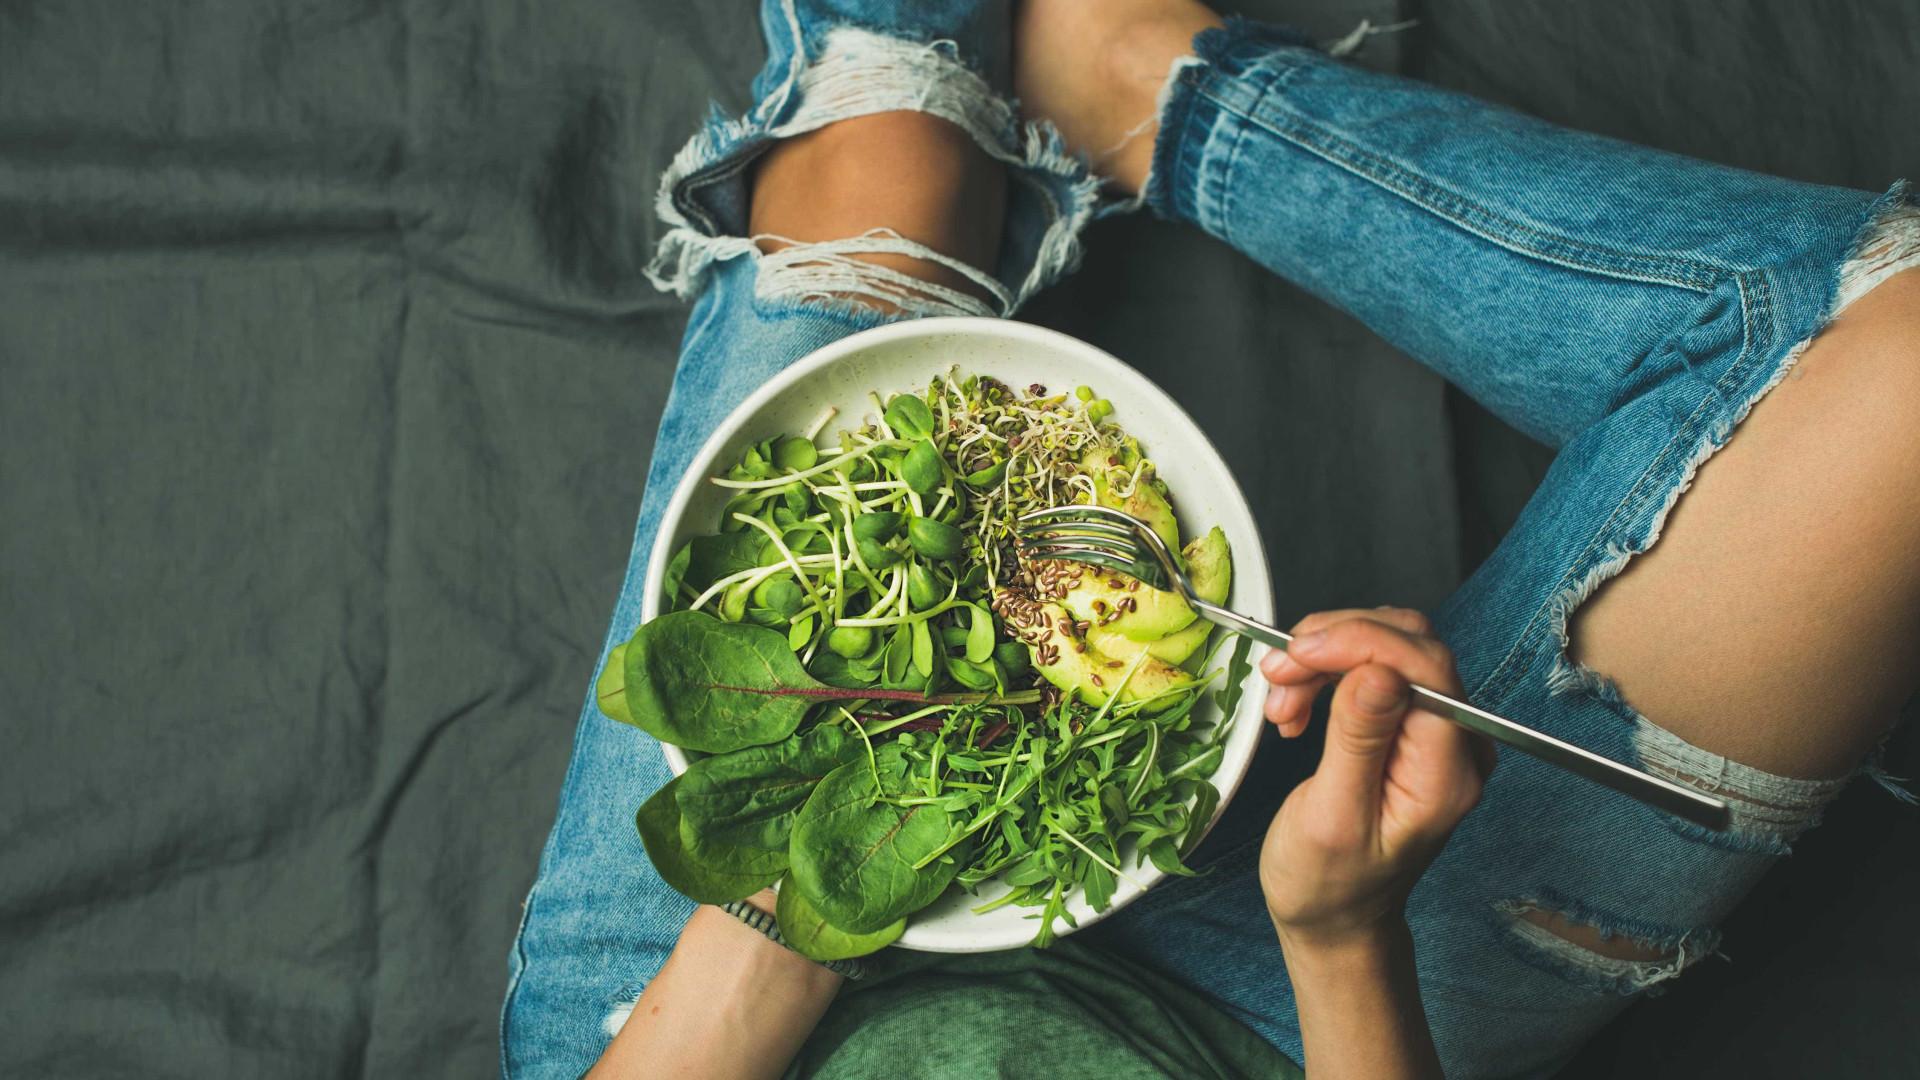 Zero alerta para sistema alimentar e defende estratégia para leguminosas